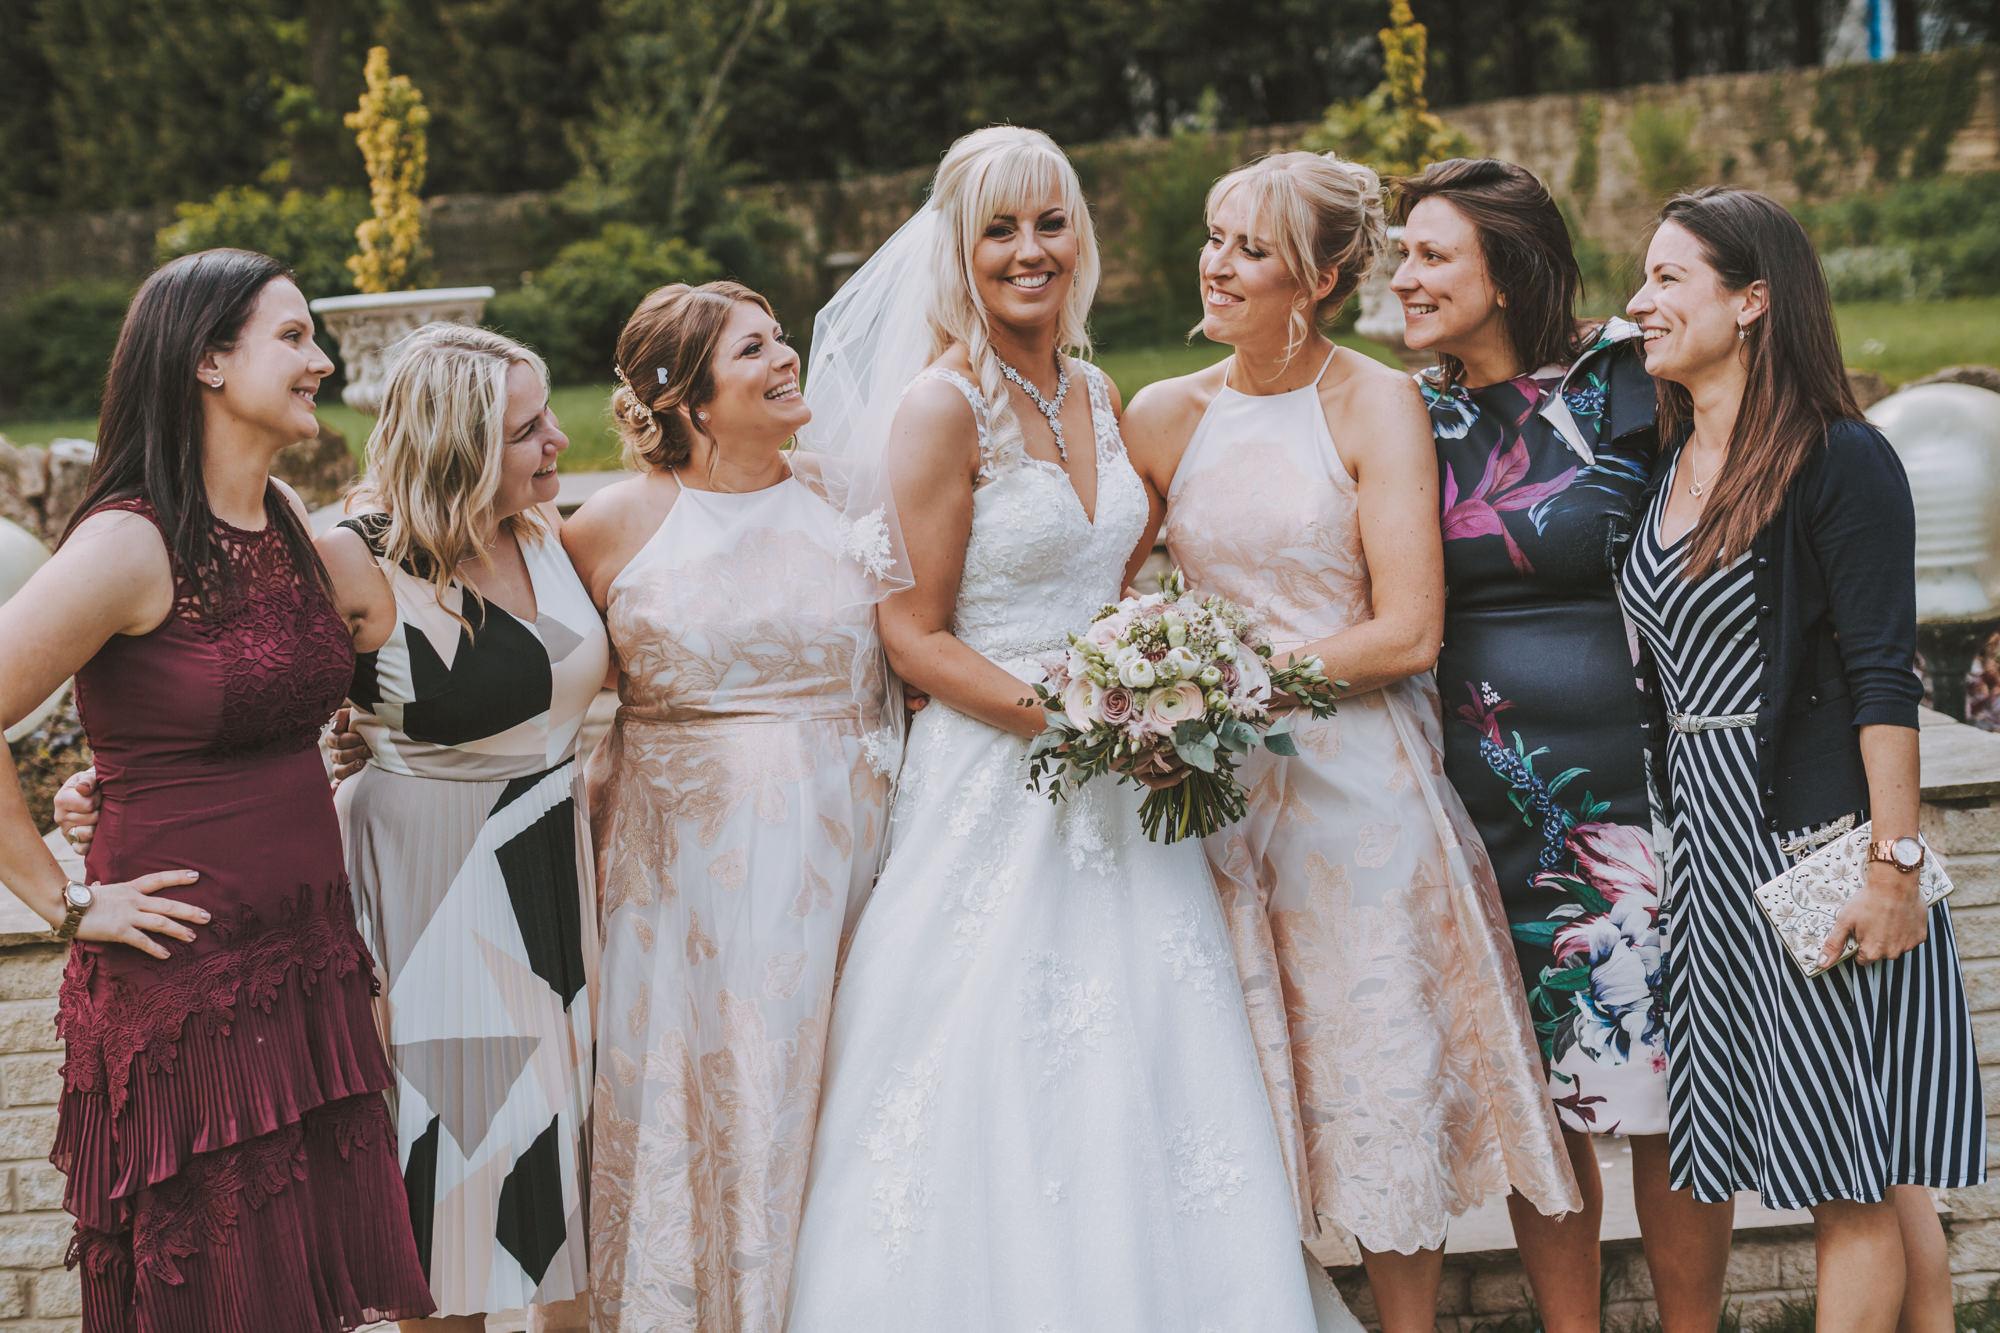 hellaby hall wedding photographers in rotherham, yorkshire-49.jpg